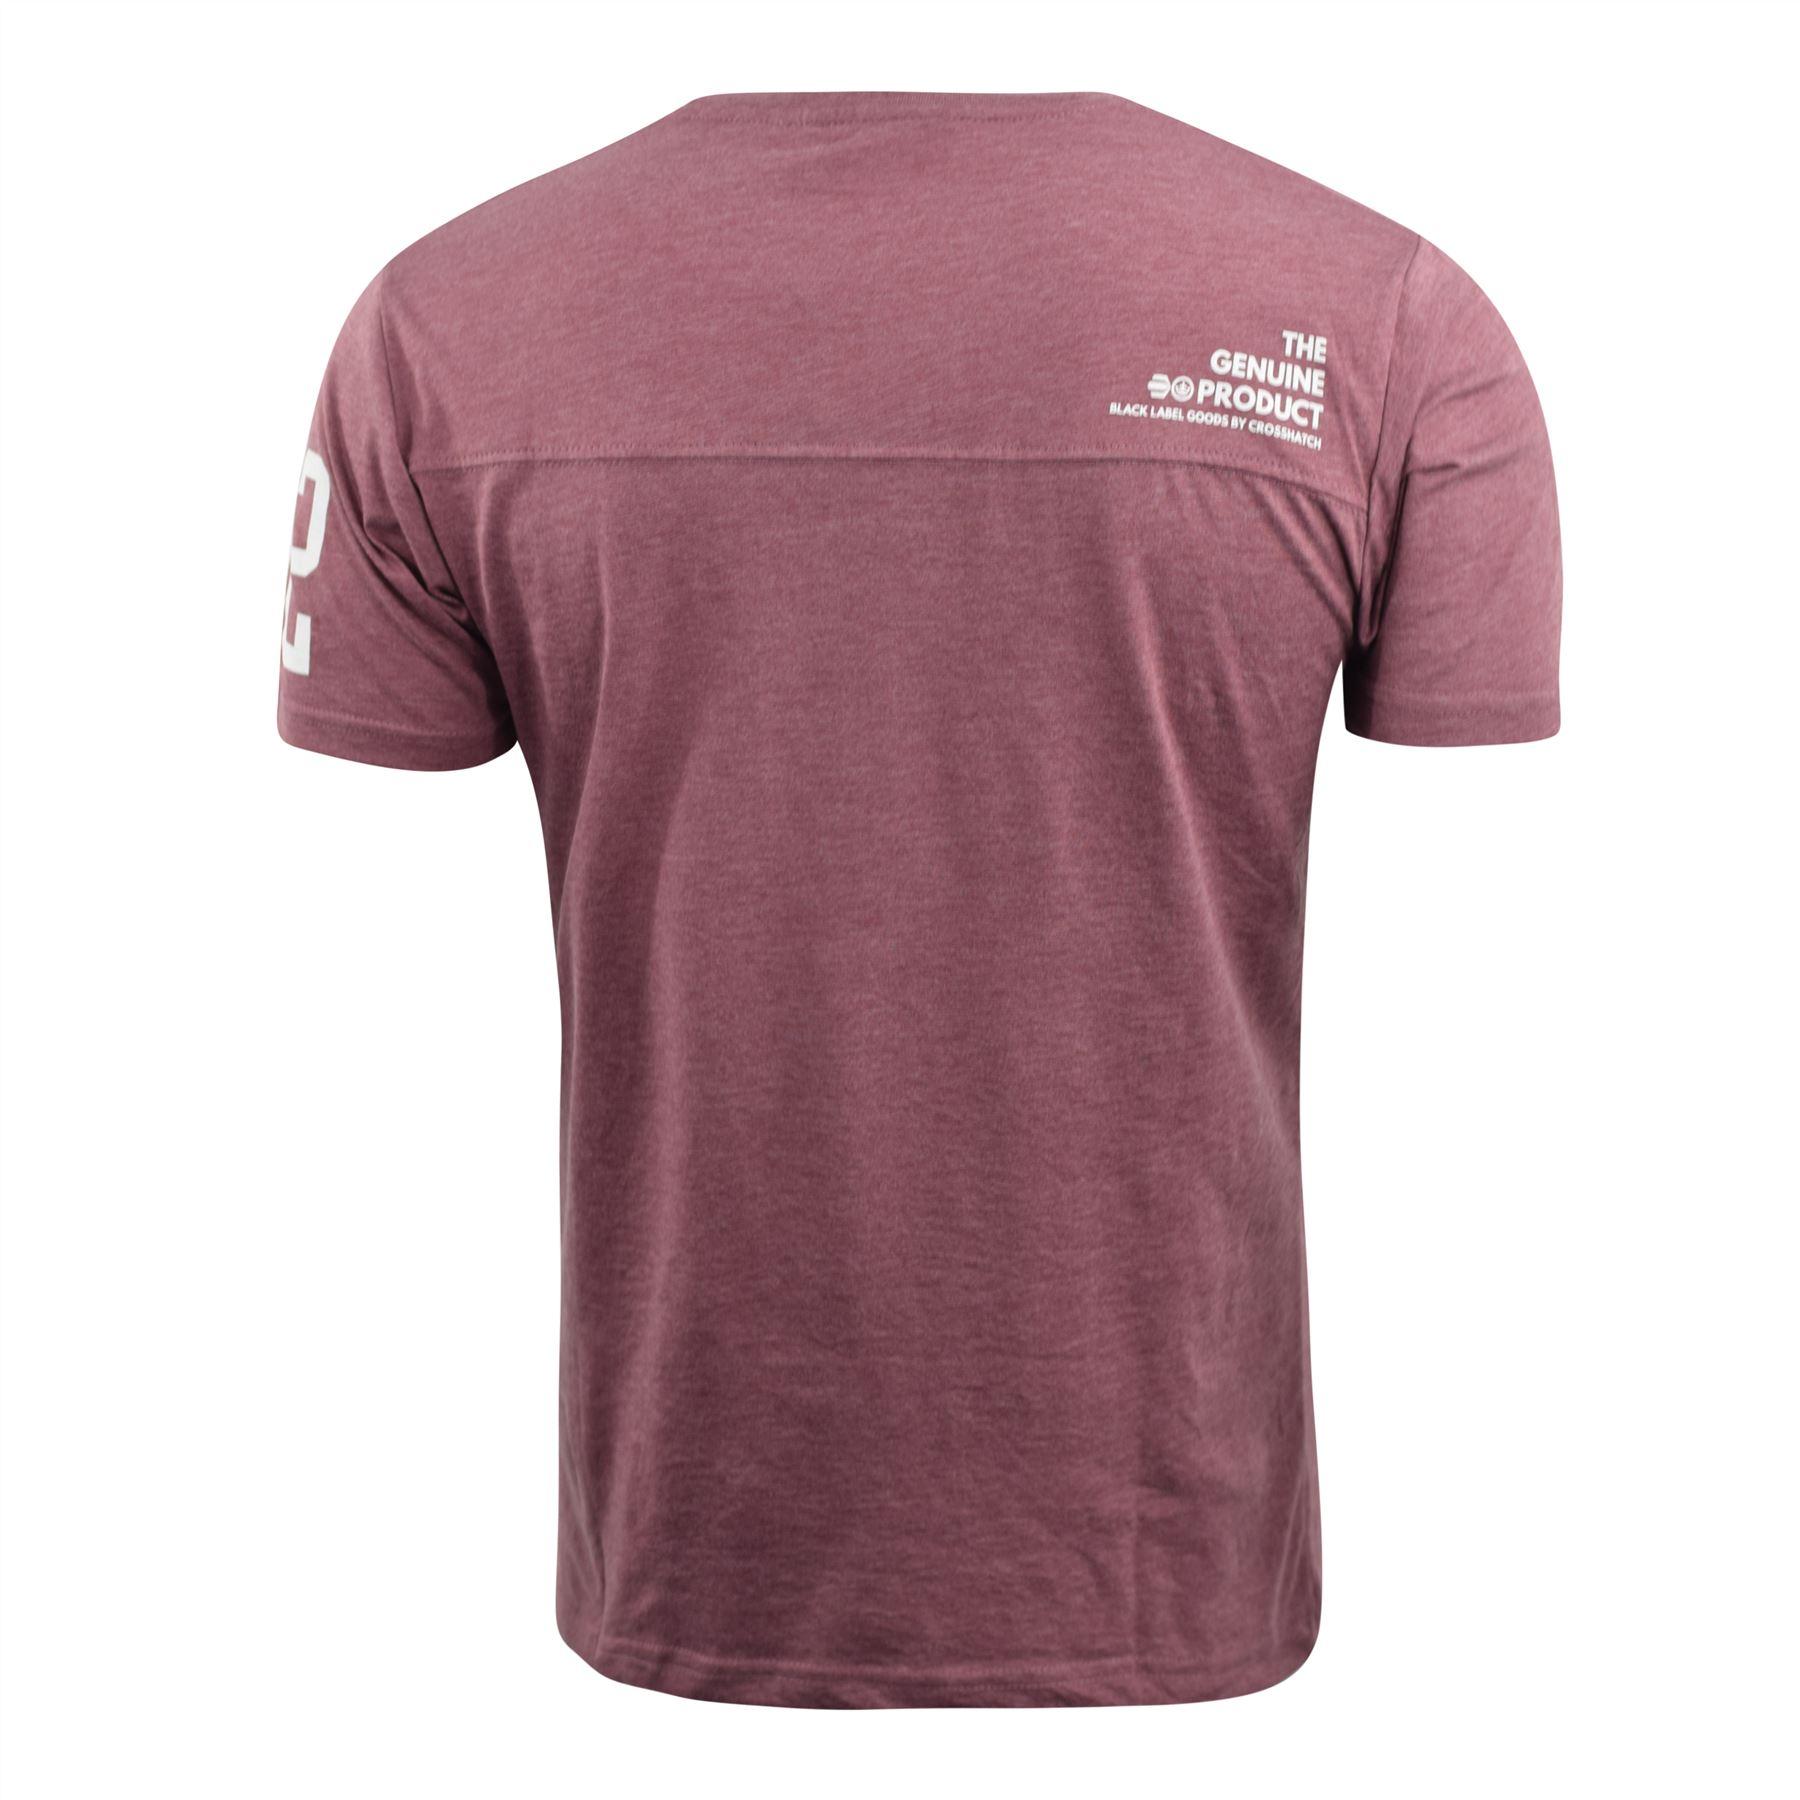 Mens-Crosshatch-T-Shirt-Contrast-Short-Sleeve-Tee-Top-Penycoat thumbnail 10